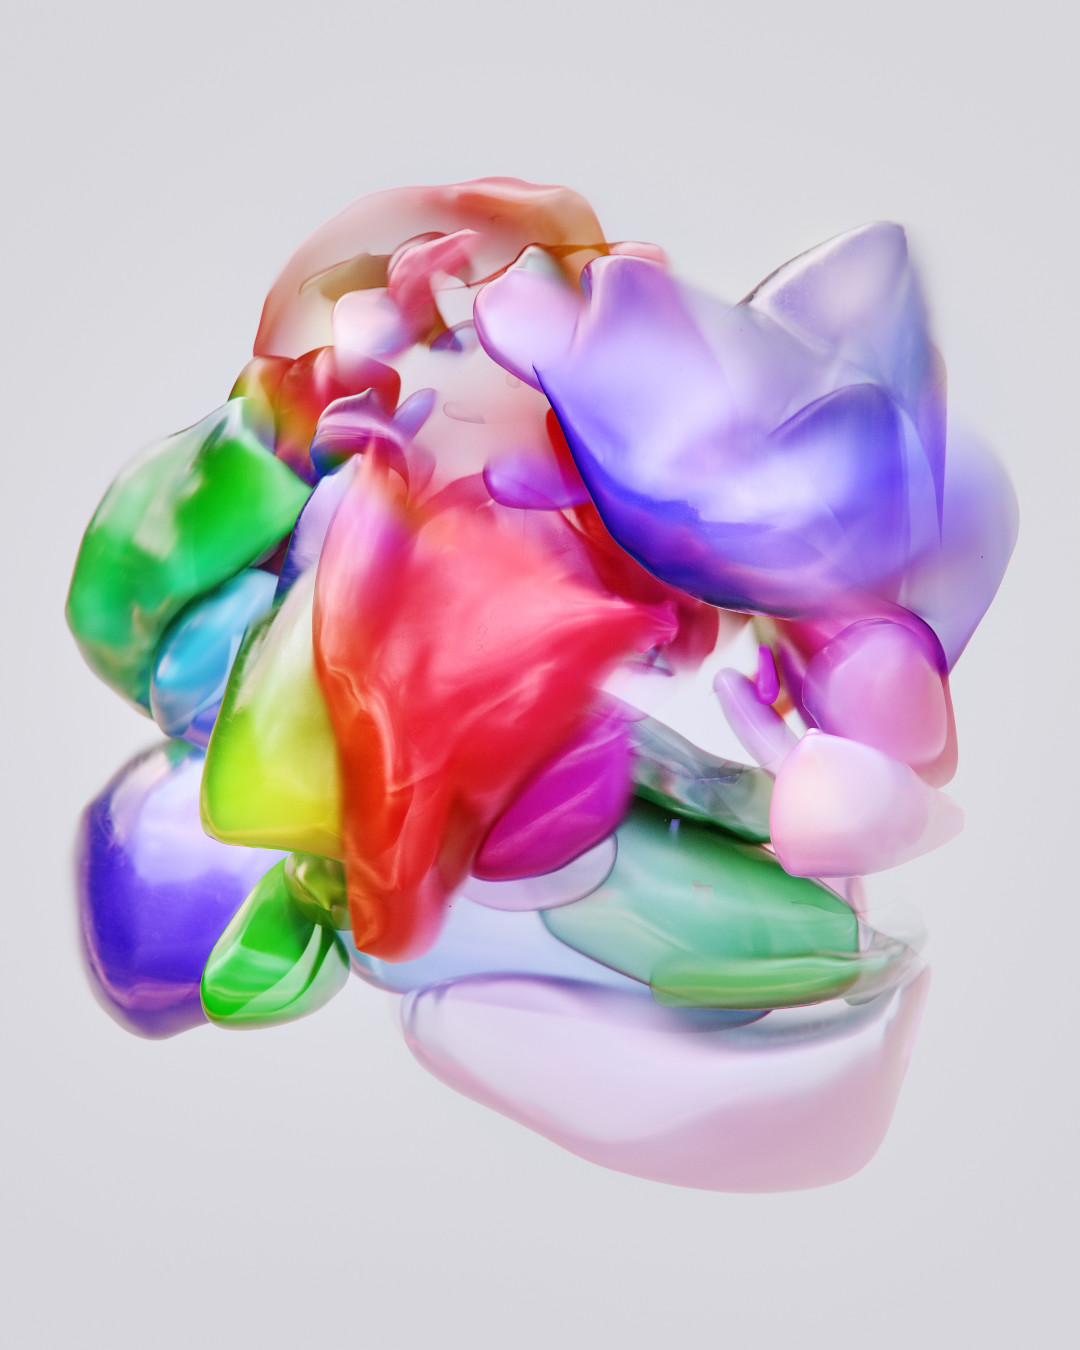 Colorclouds_08_cam1_0001